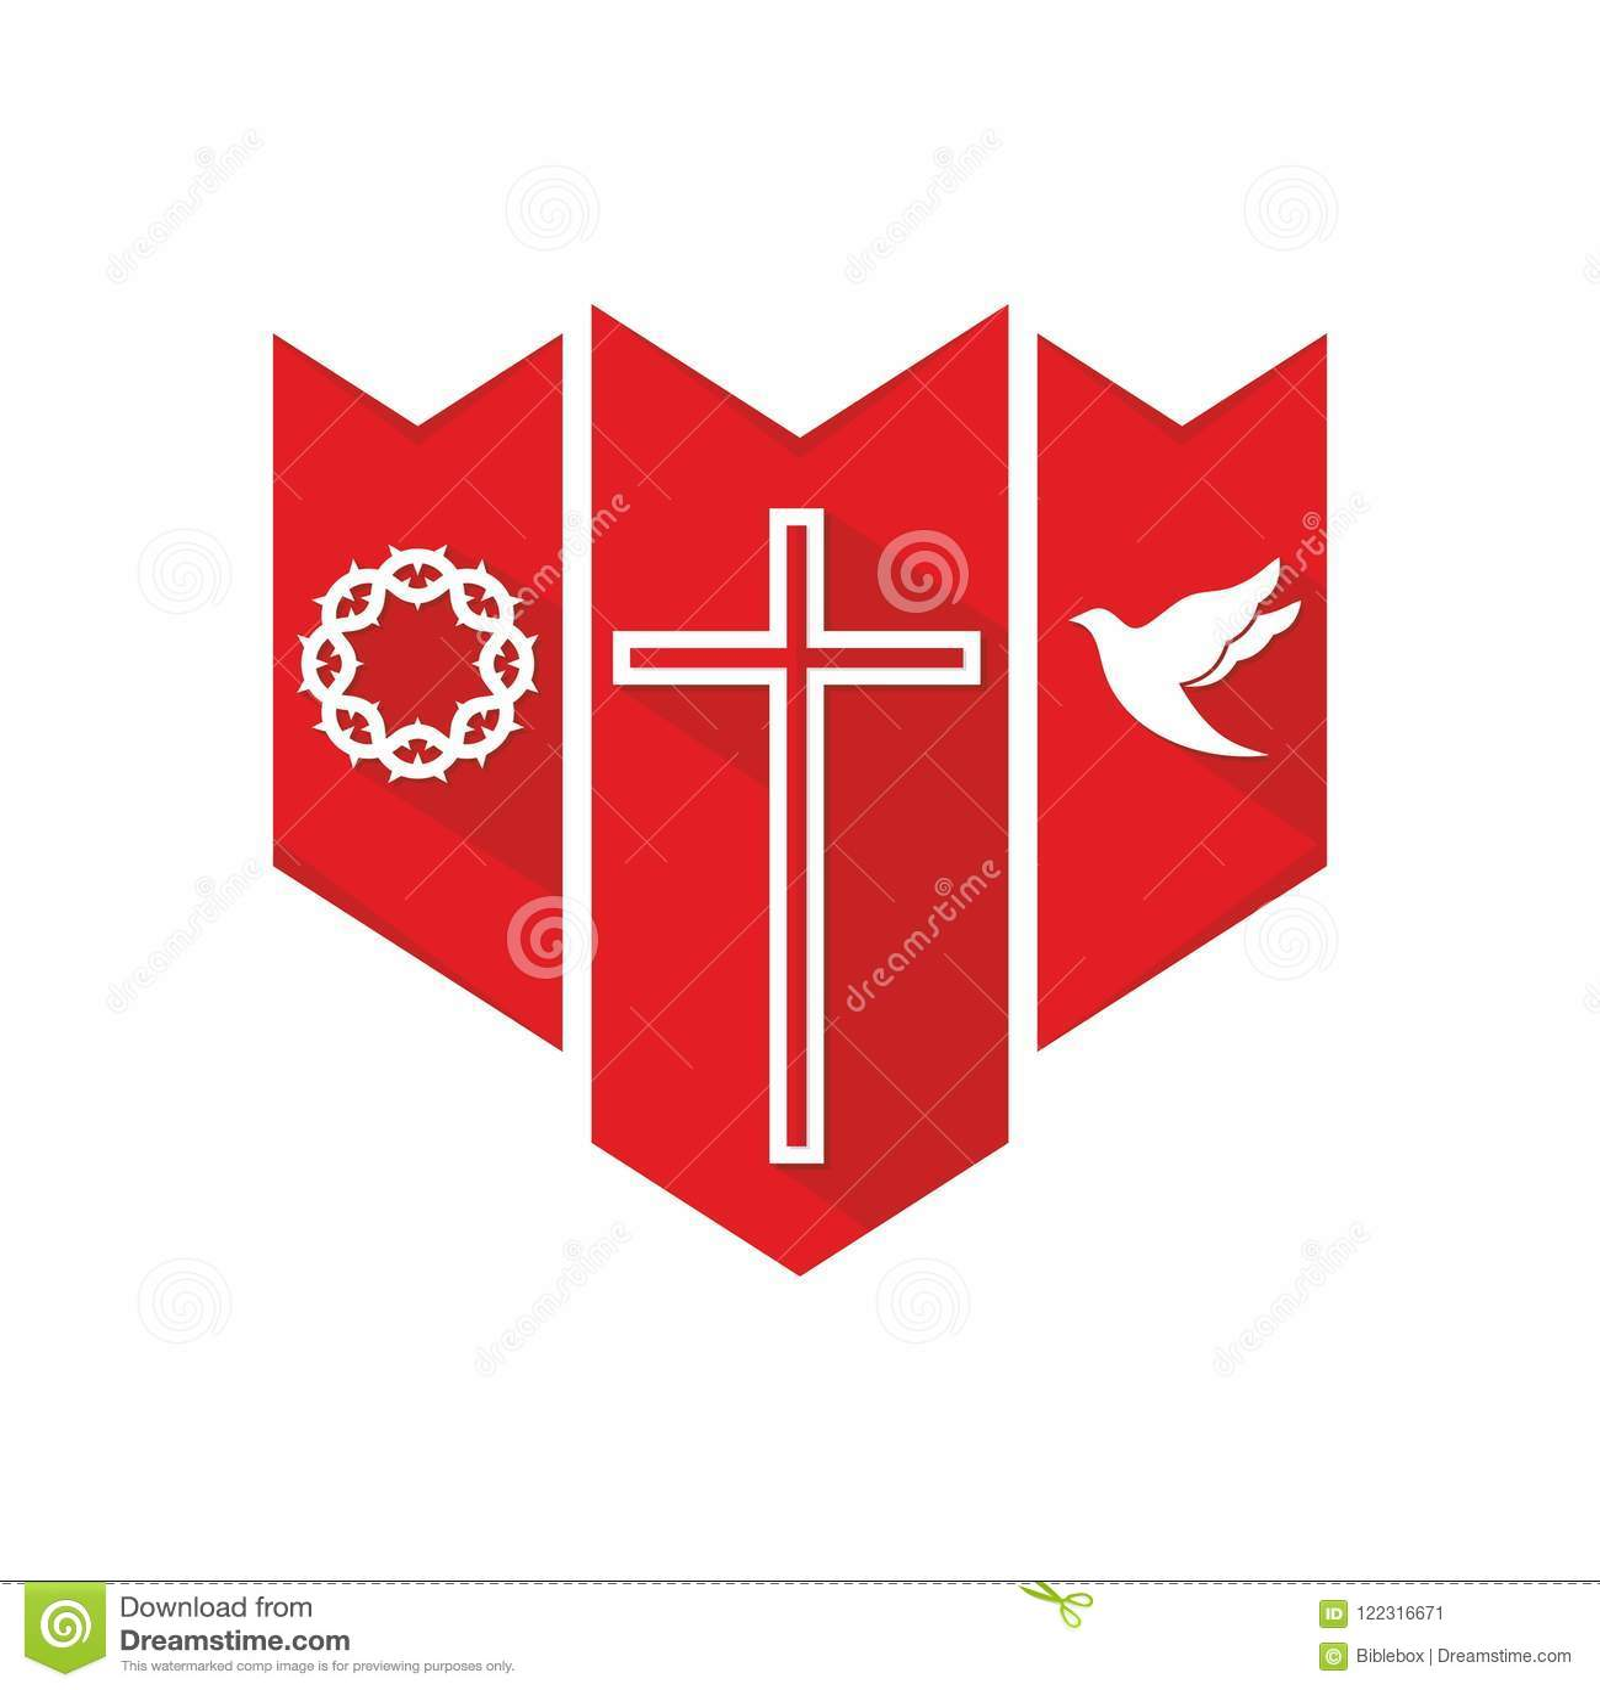 Church Logo Christian Symbols The Cross Of The Lord And Savior